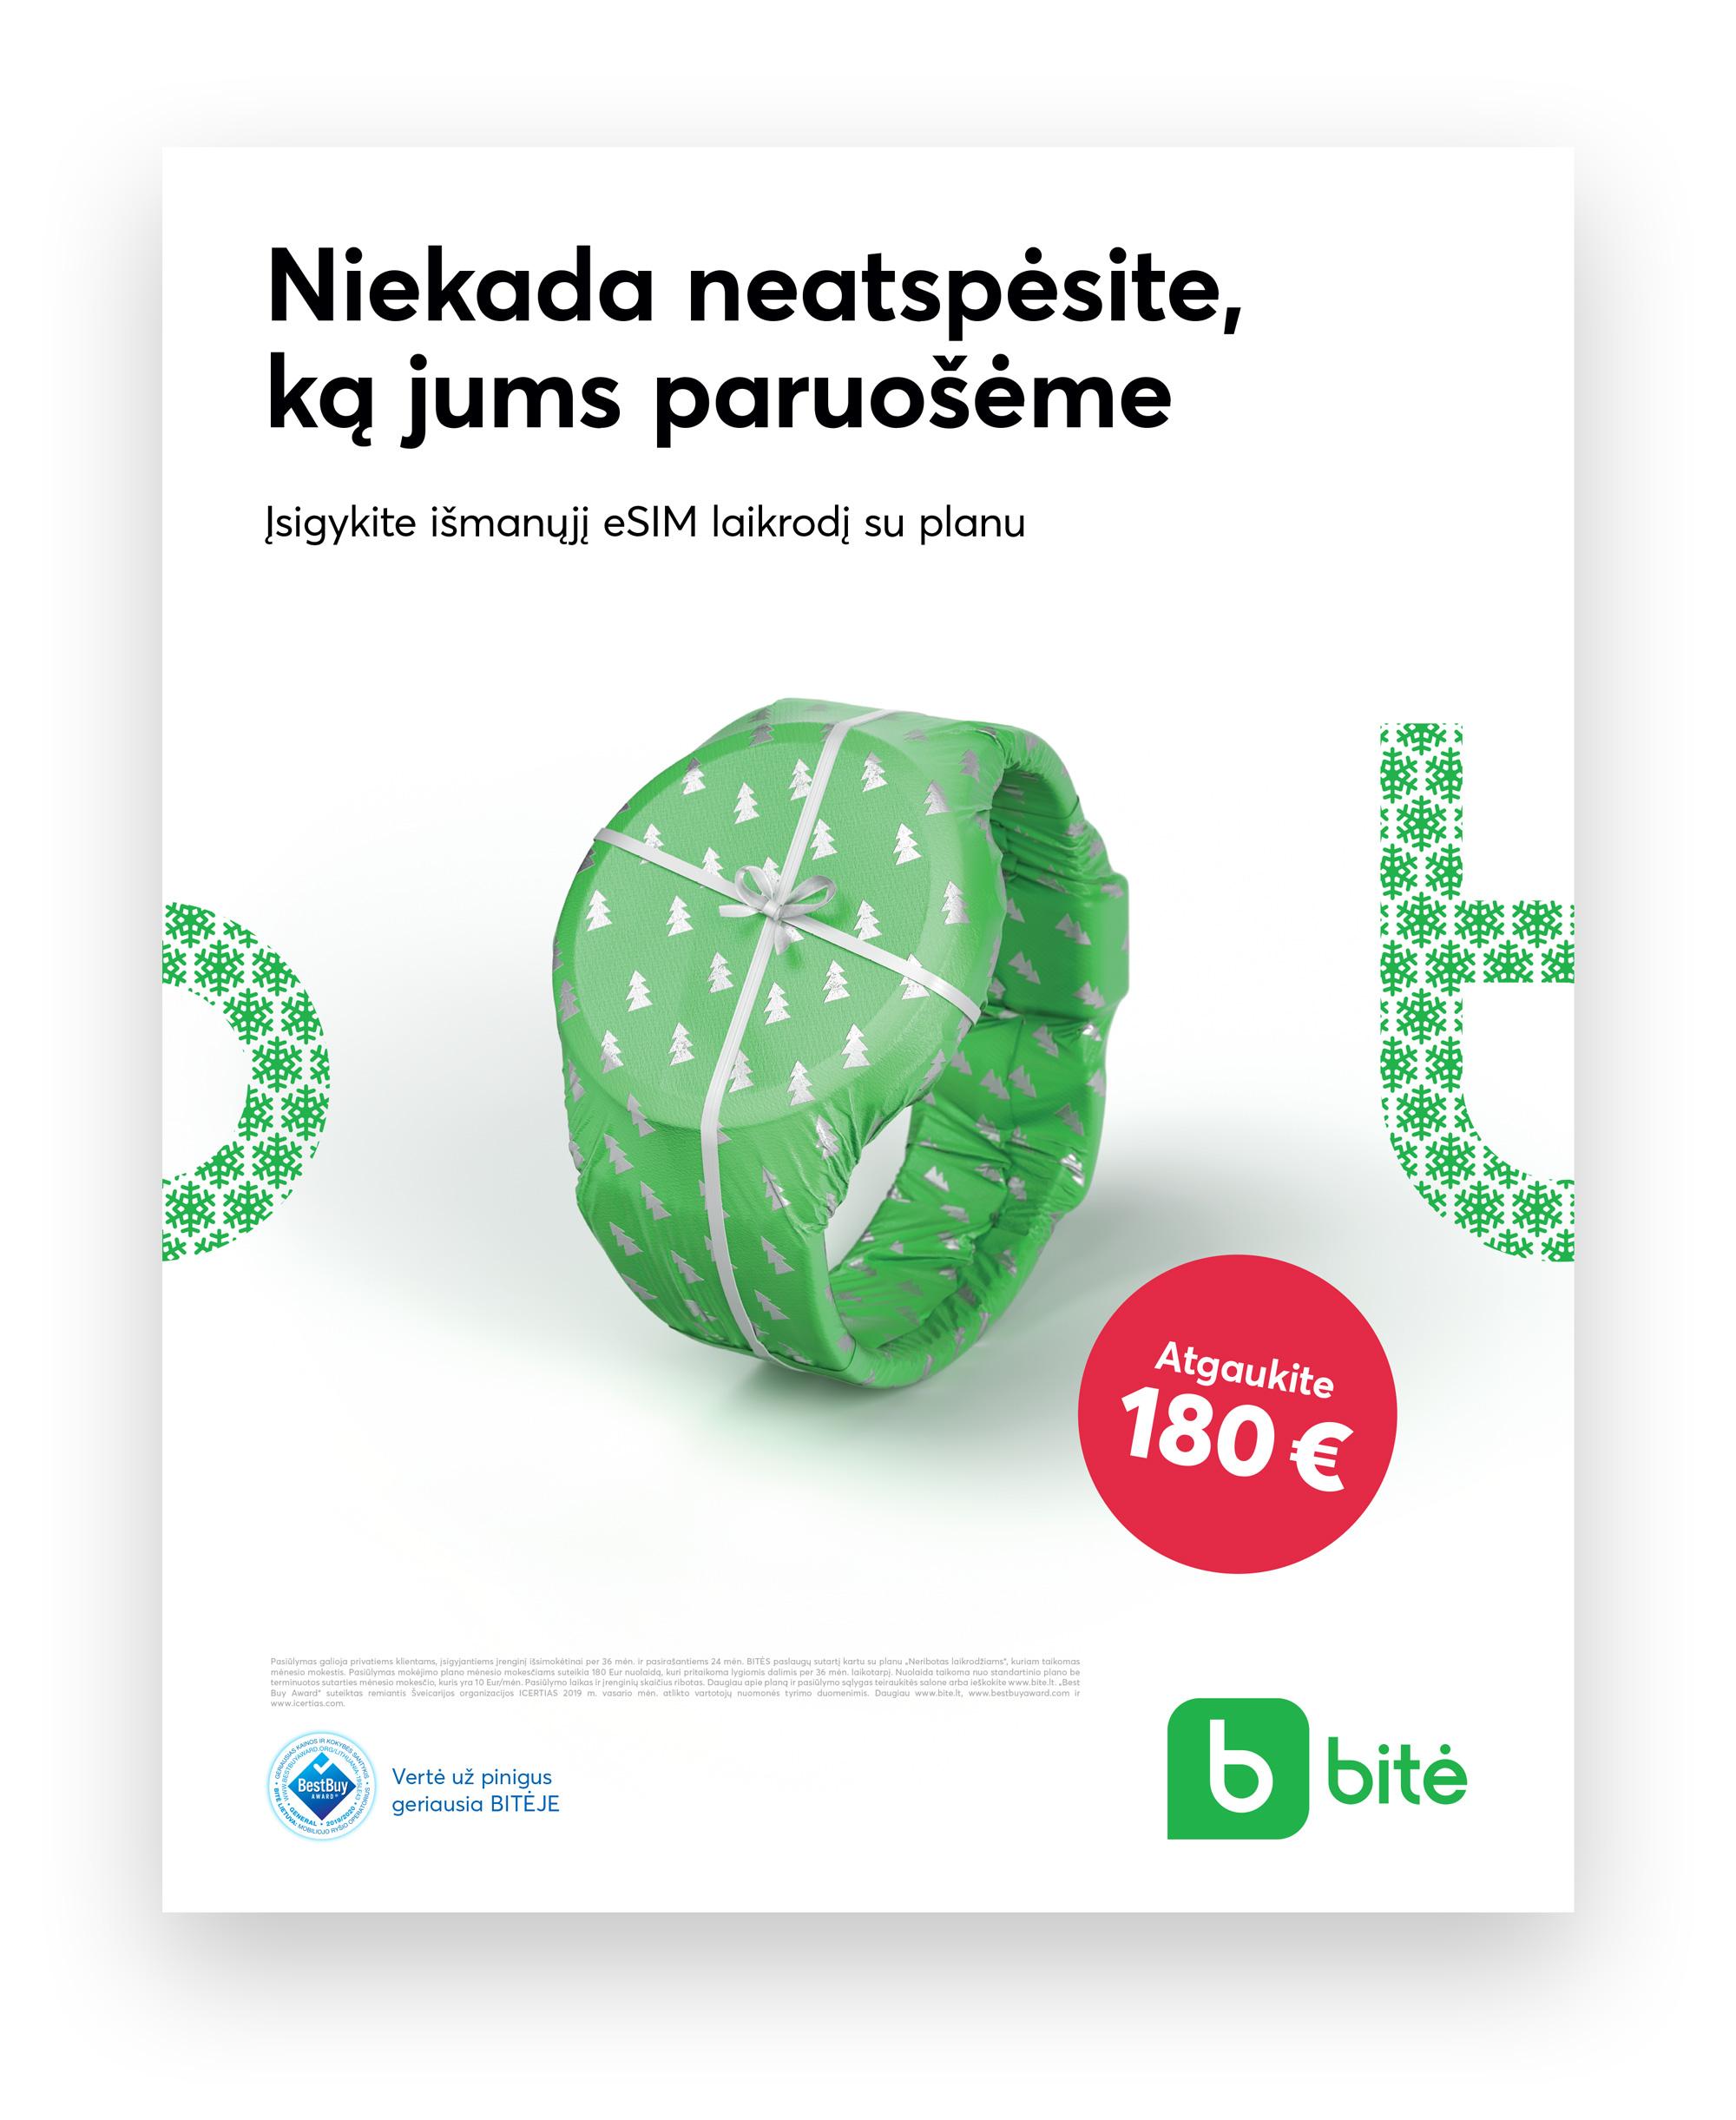 Bite-2019-kaledos-800-x-1000-copy